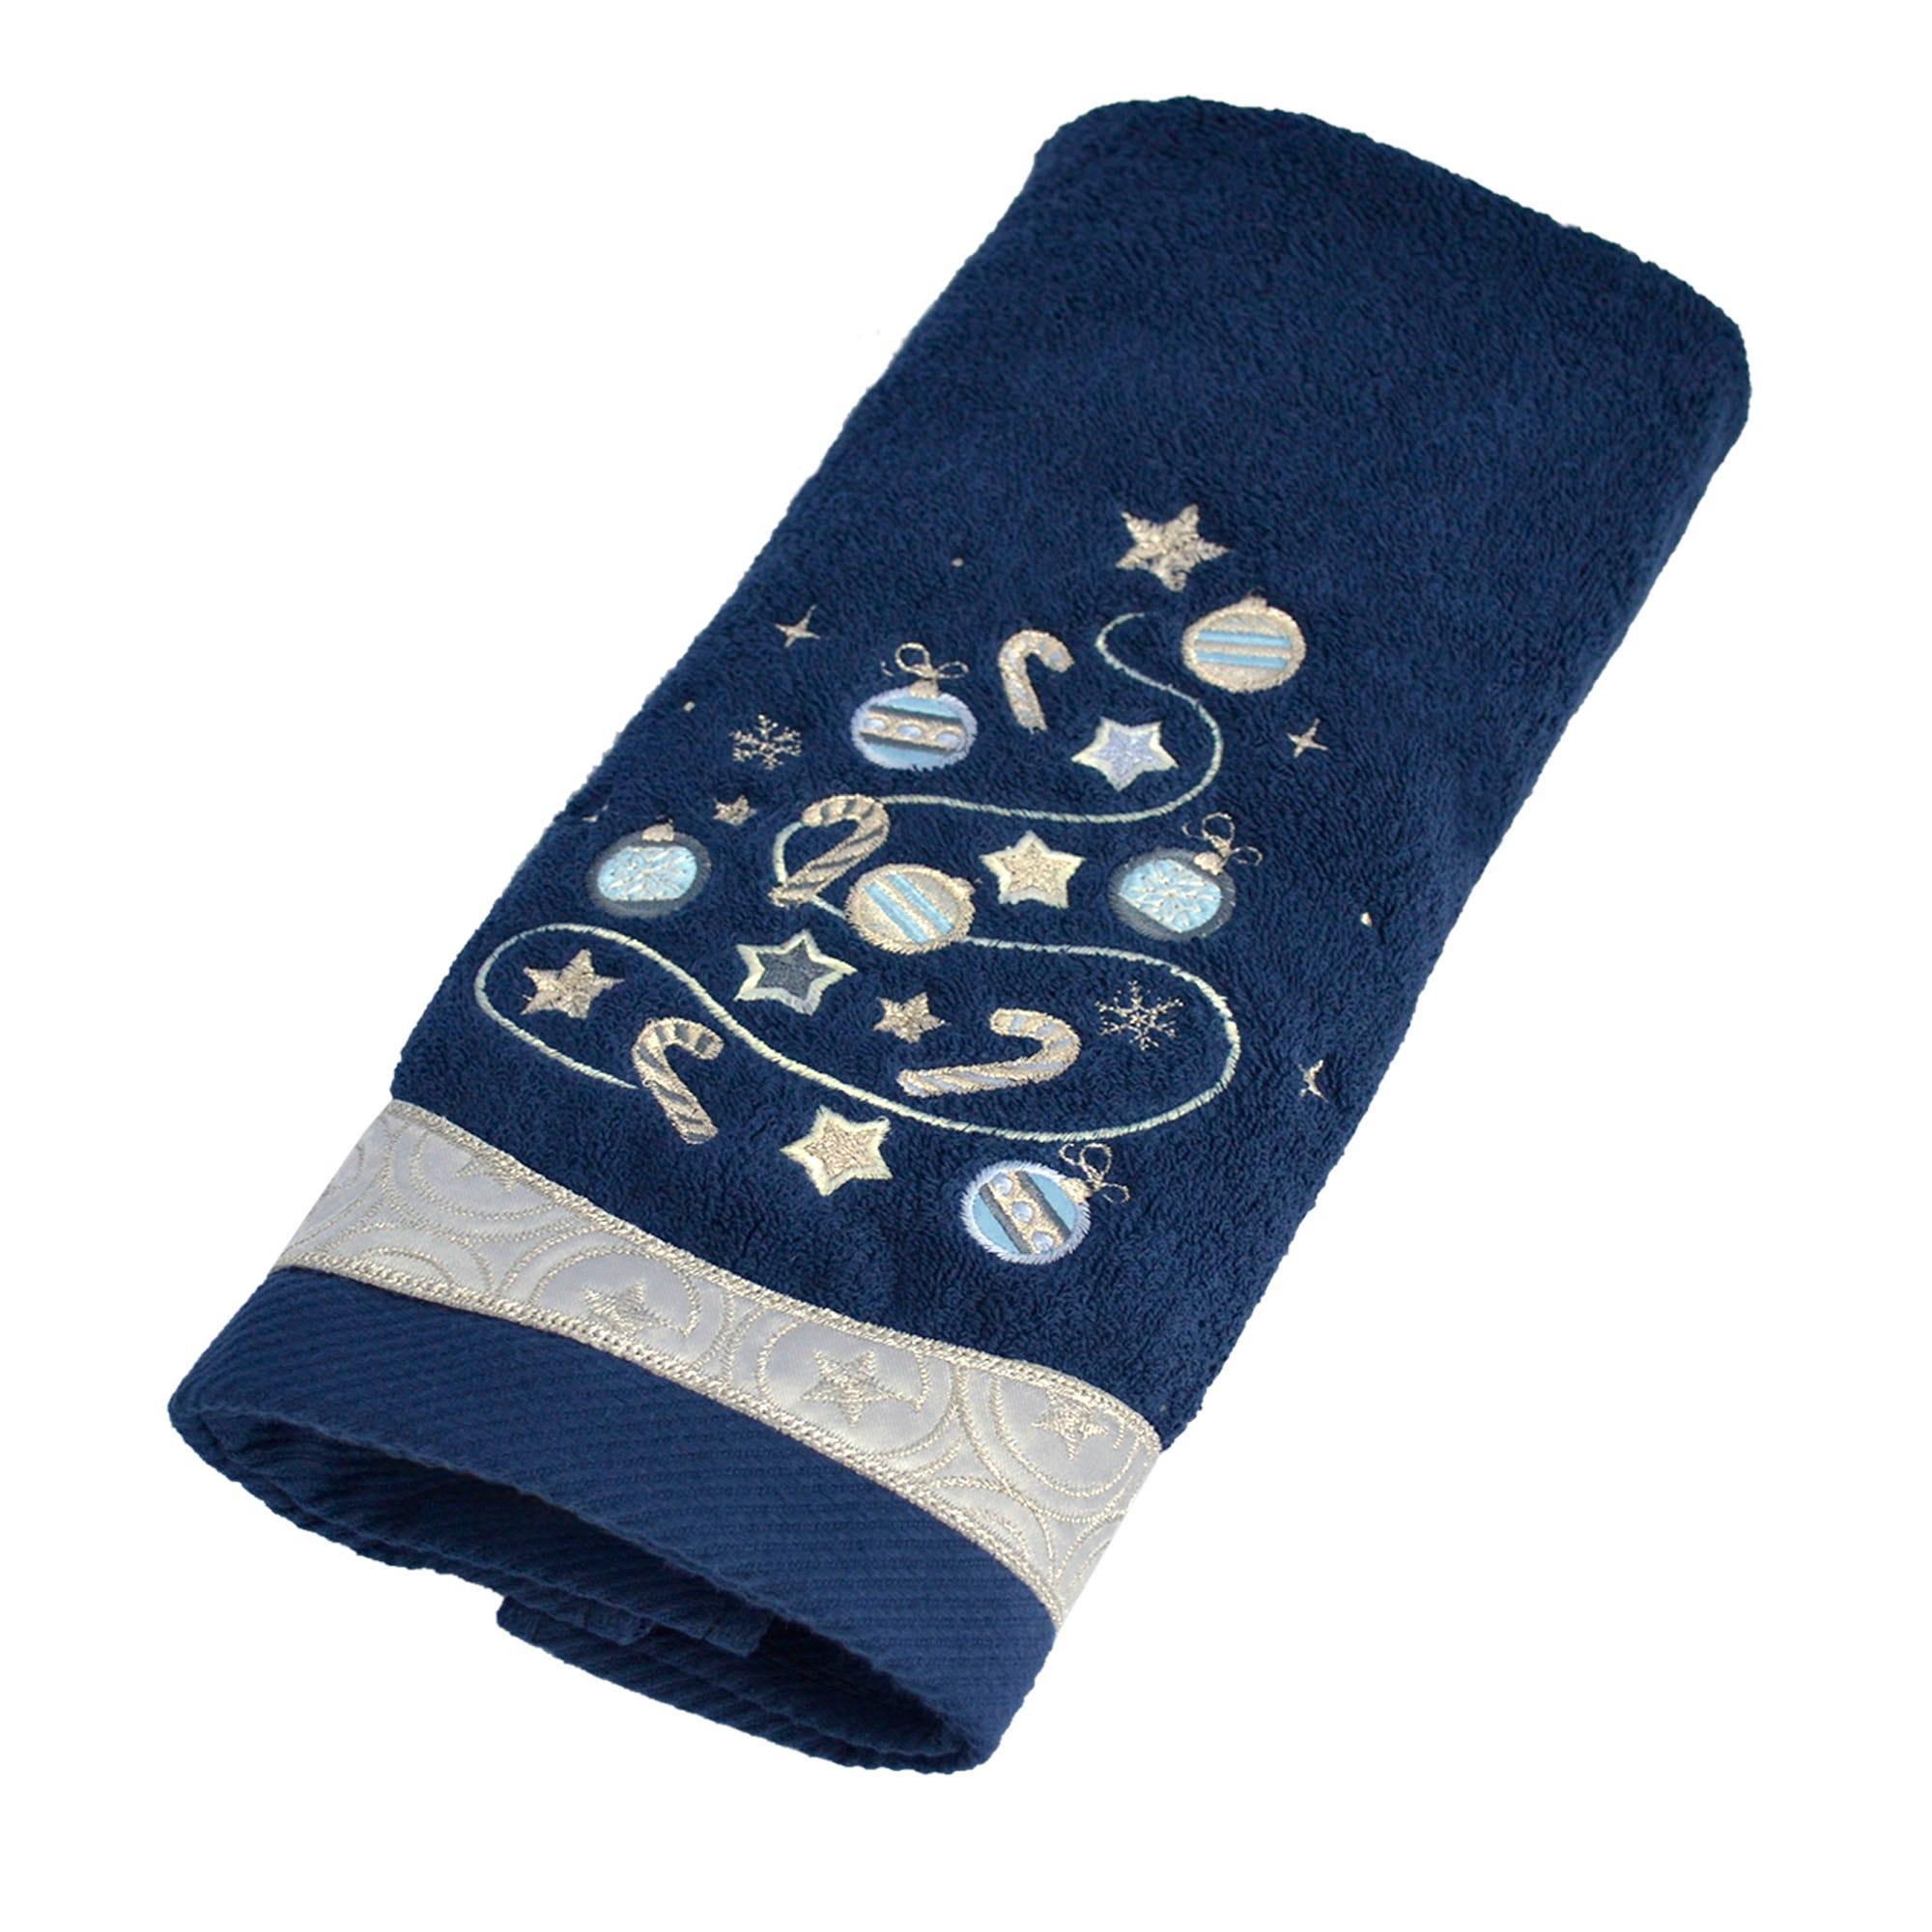 Toalla para manos de algodón Blue Tree color azul